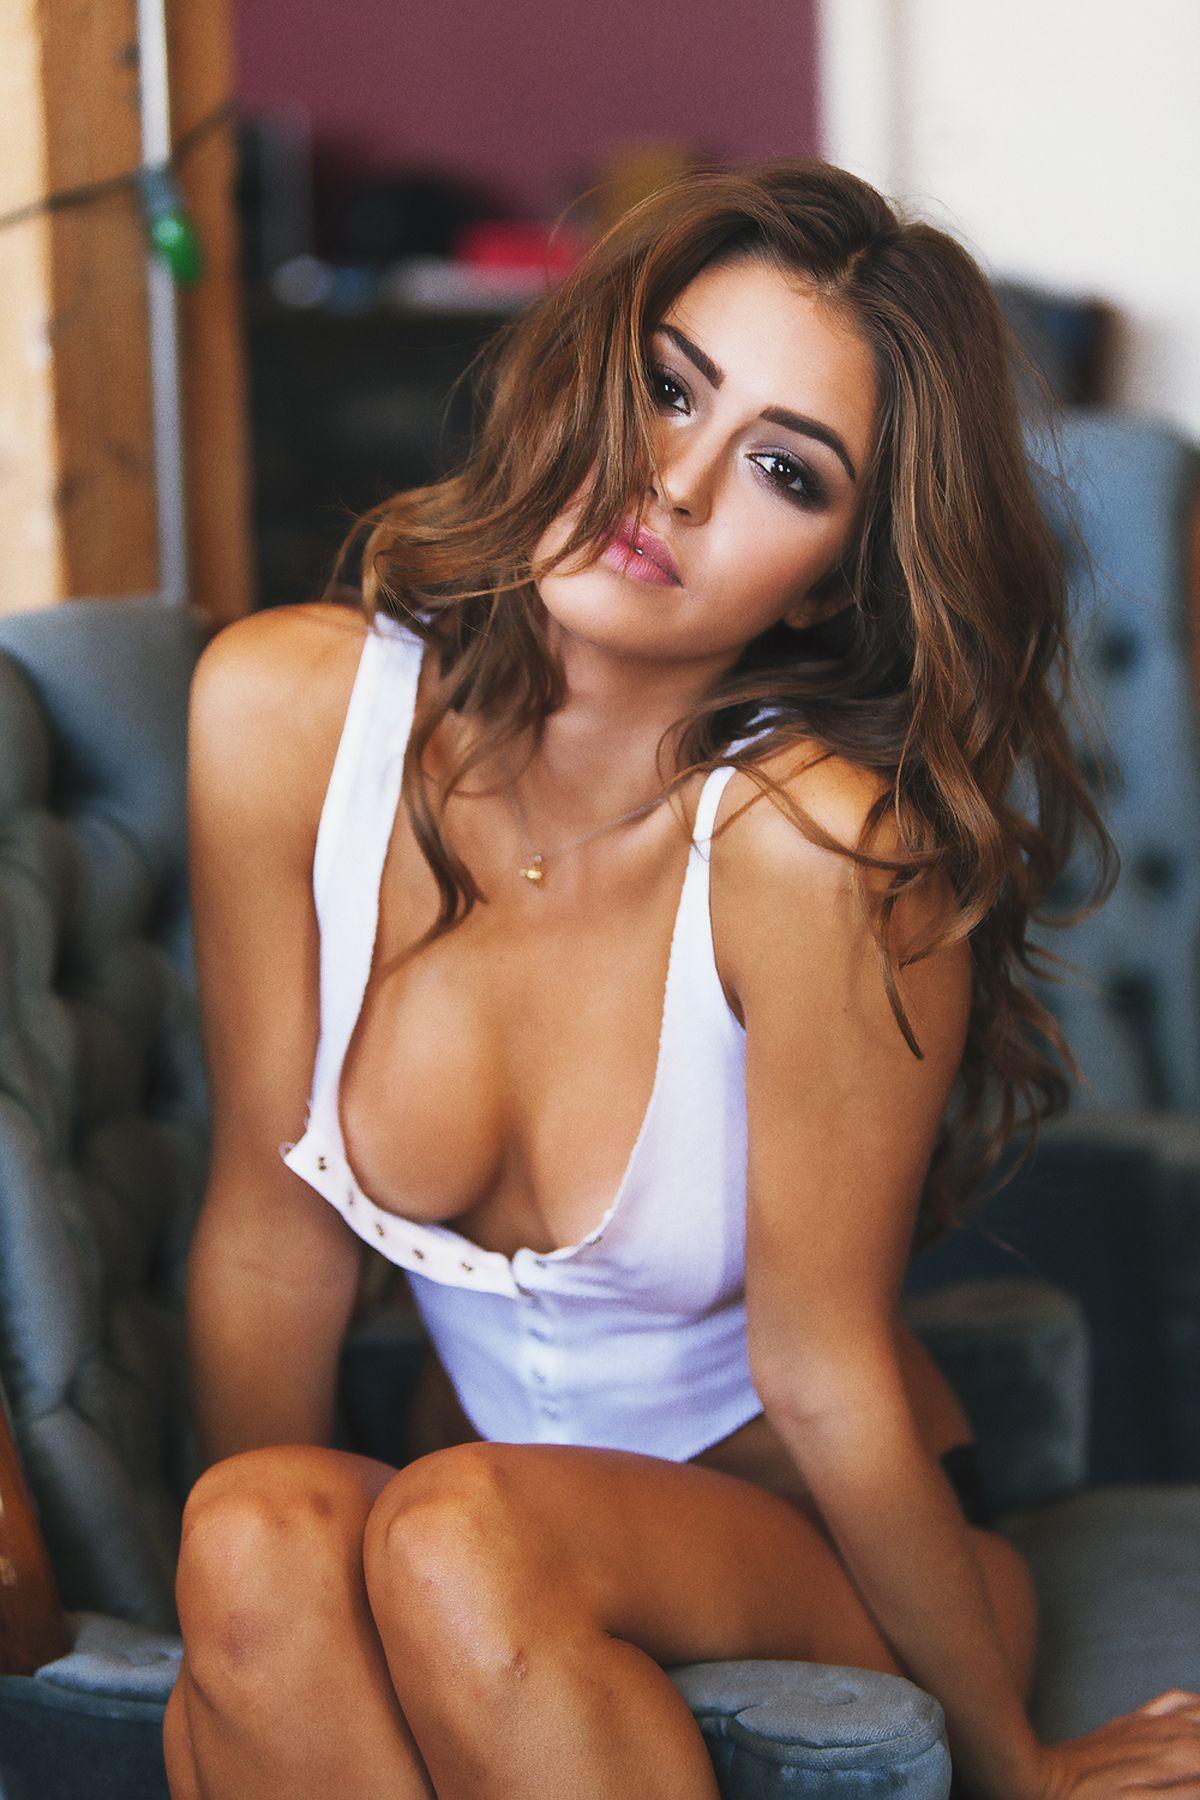 Hot brunette DP